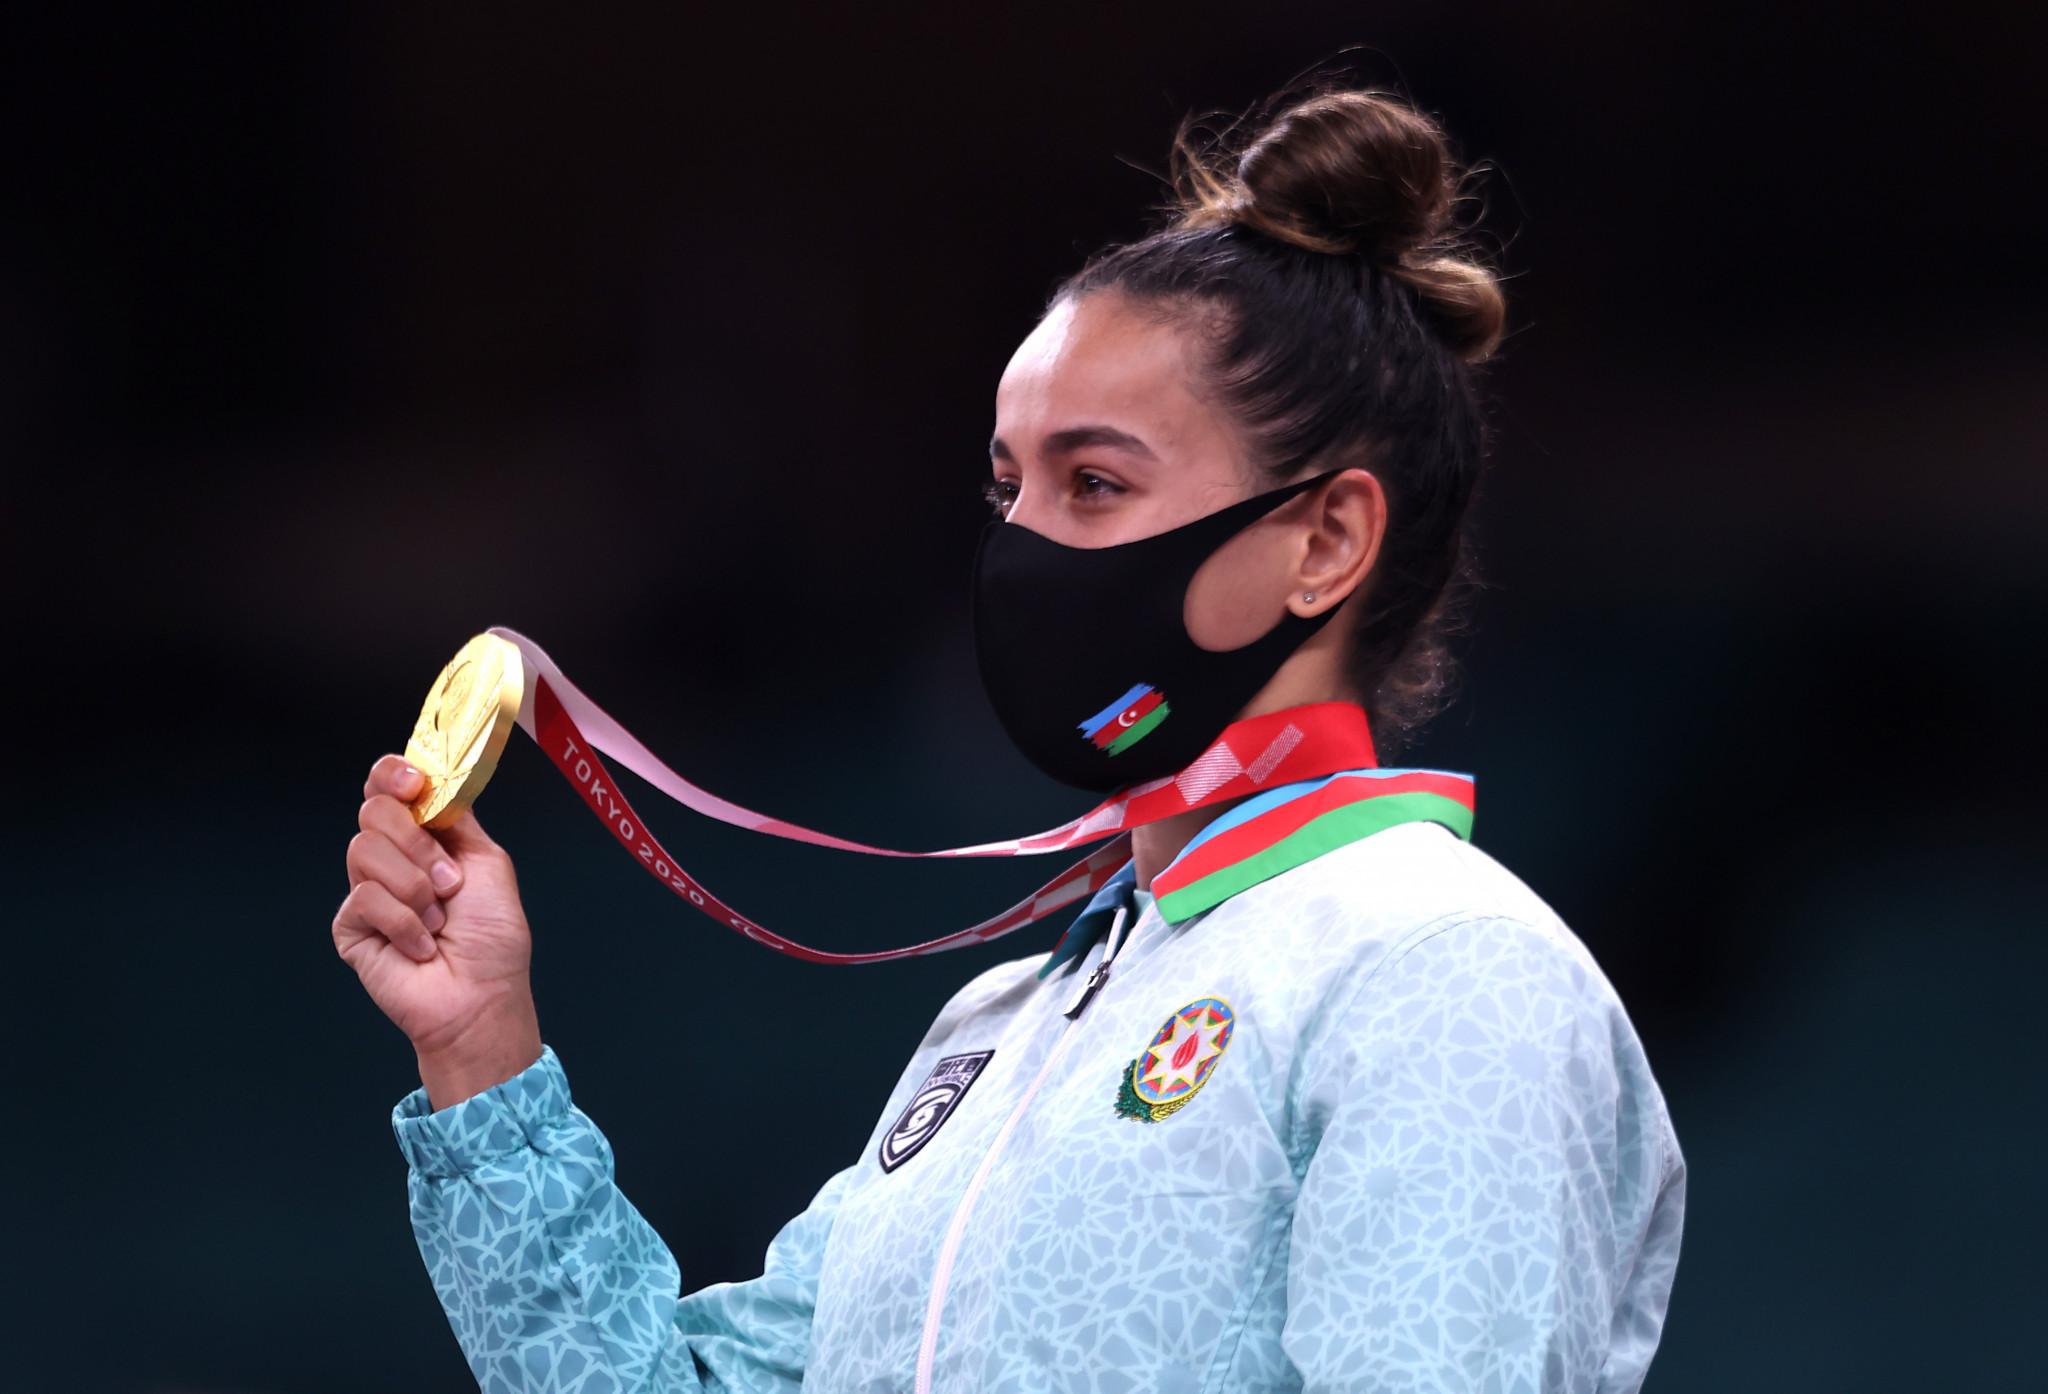 Azerbaijan win three golds on second day of judo at Tokyo 2020 Paralympics